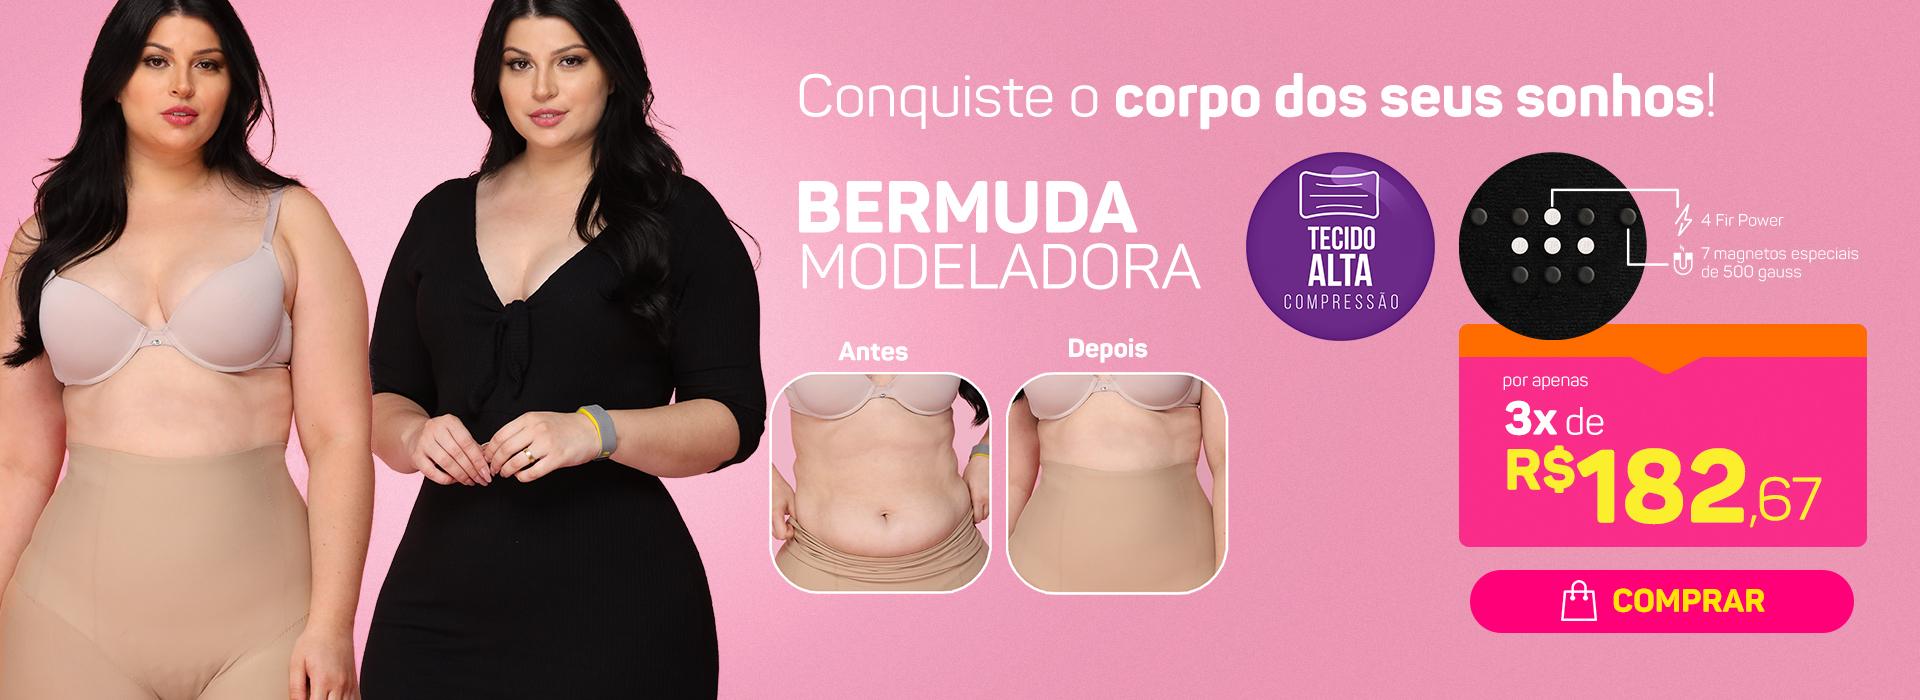 Bermuda Modeladora FIR